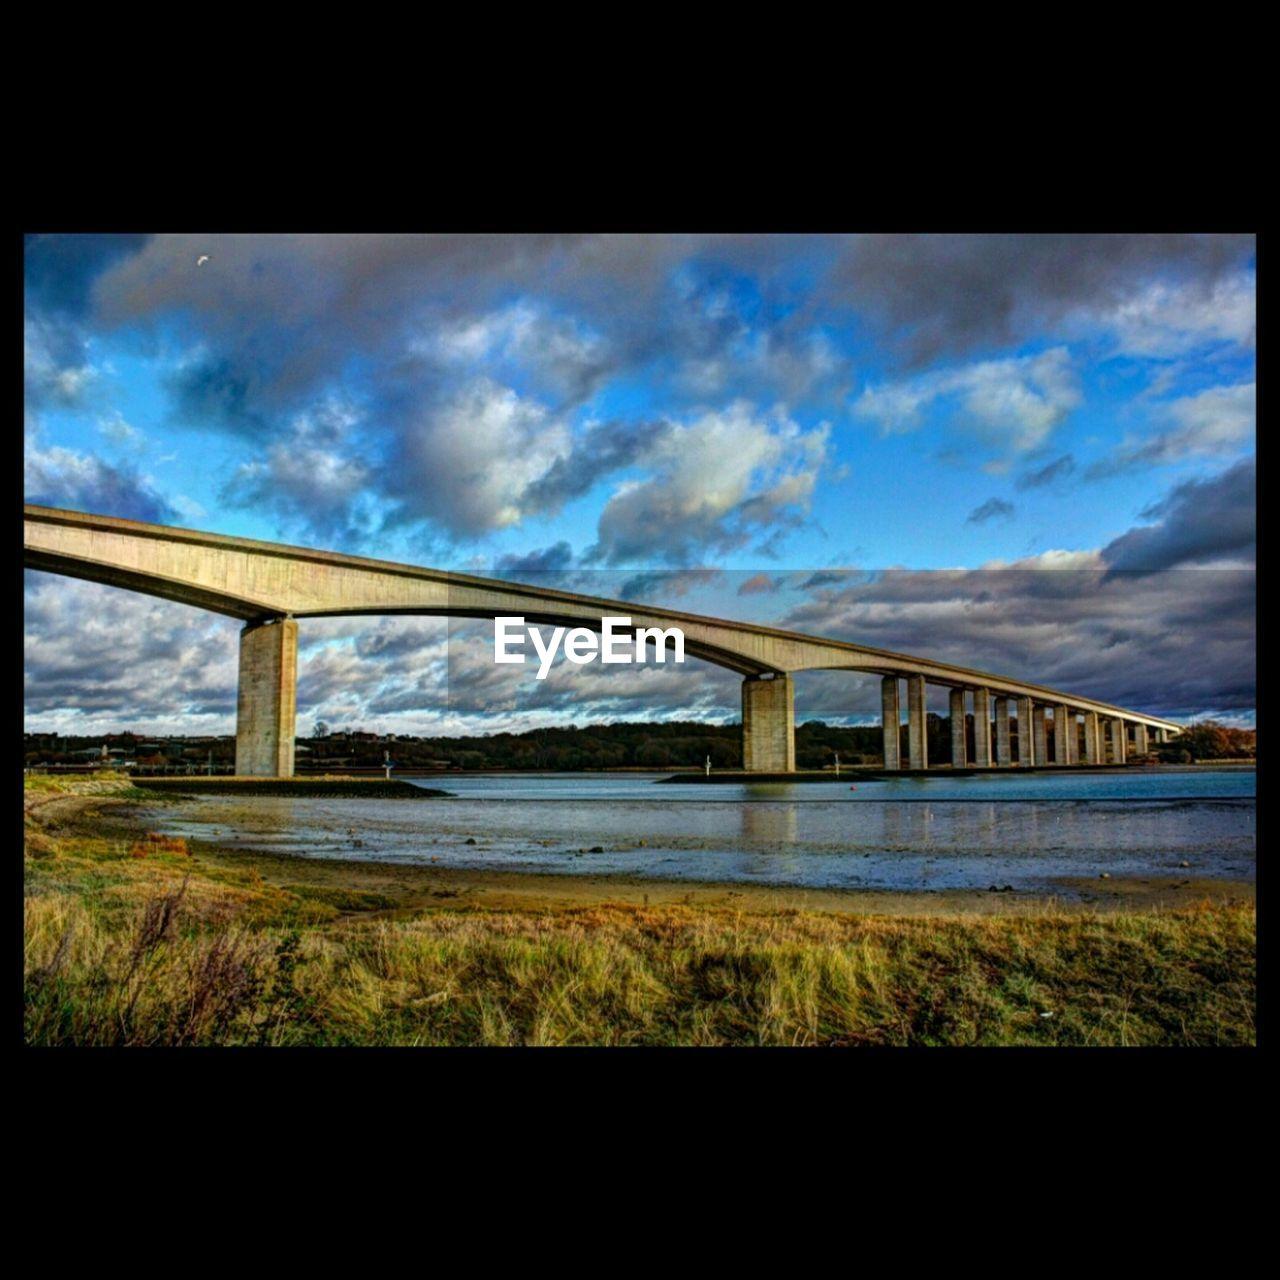 bridge - man made structure, connection, sky, architecture, cloud - sky, built structure, transportation, day, no people, bridge, grass, outdoors, nature